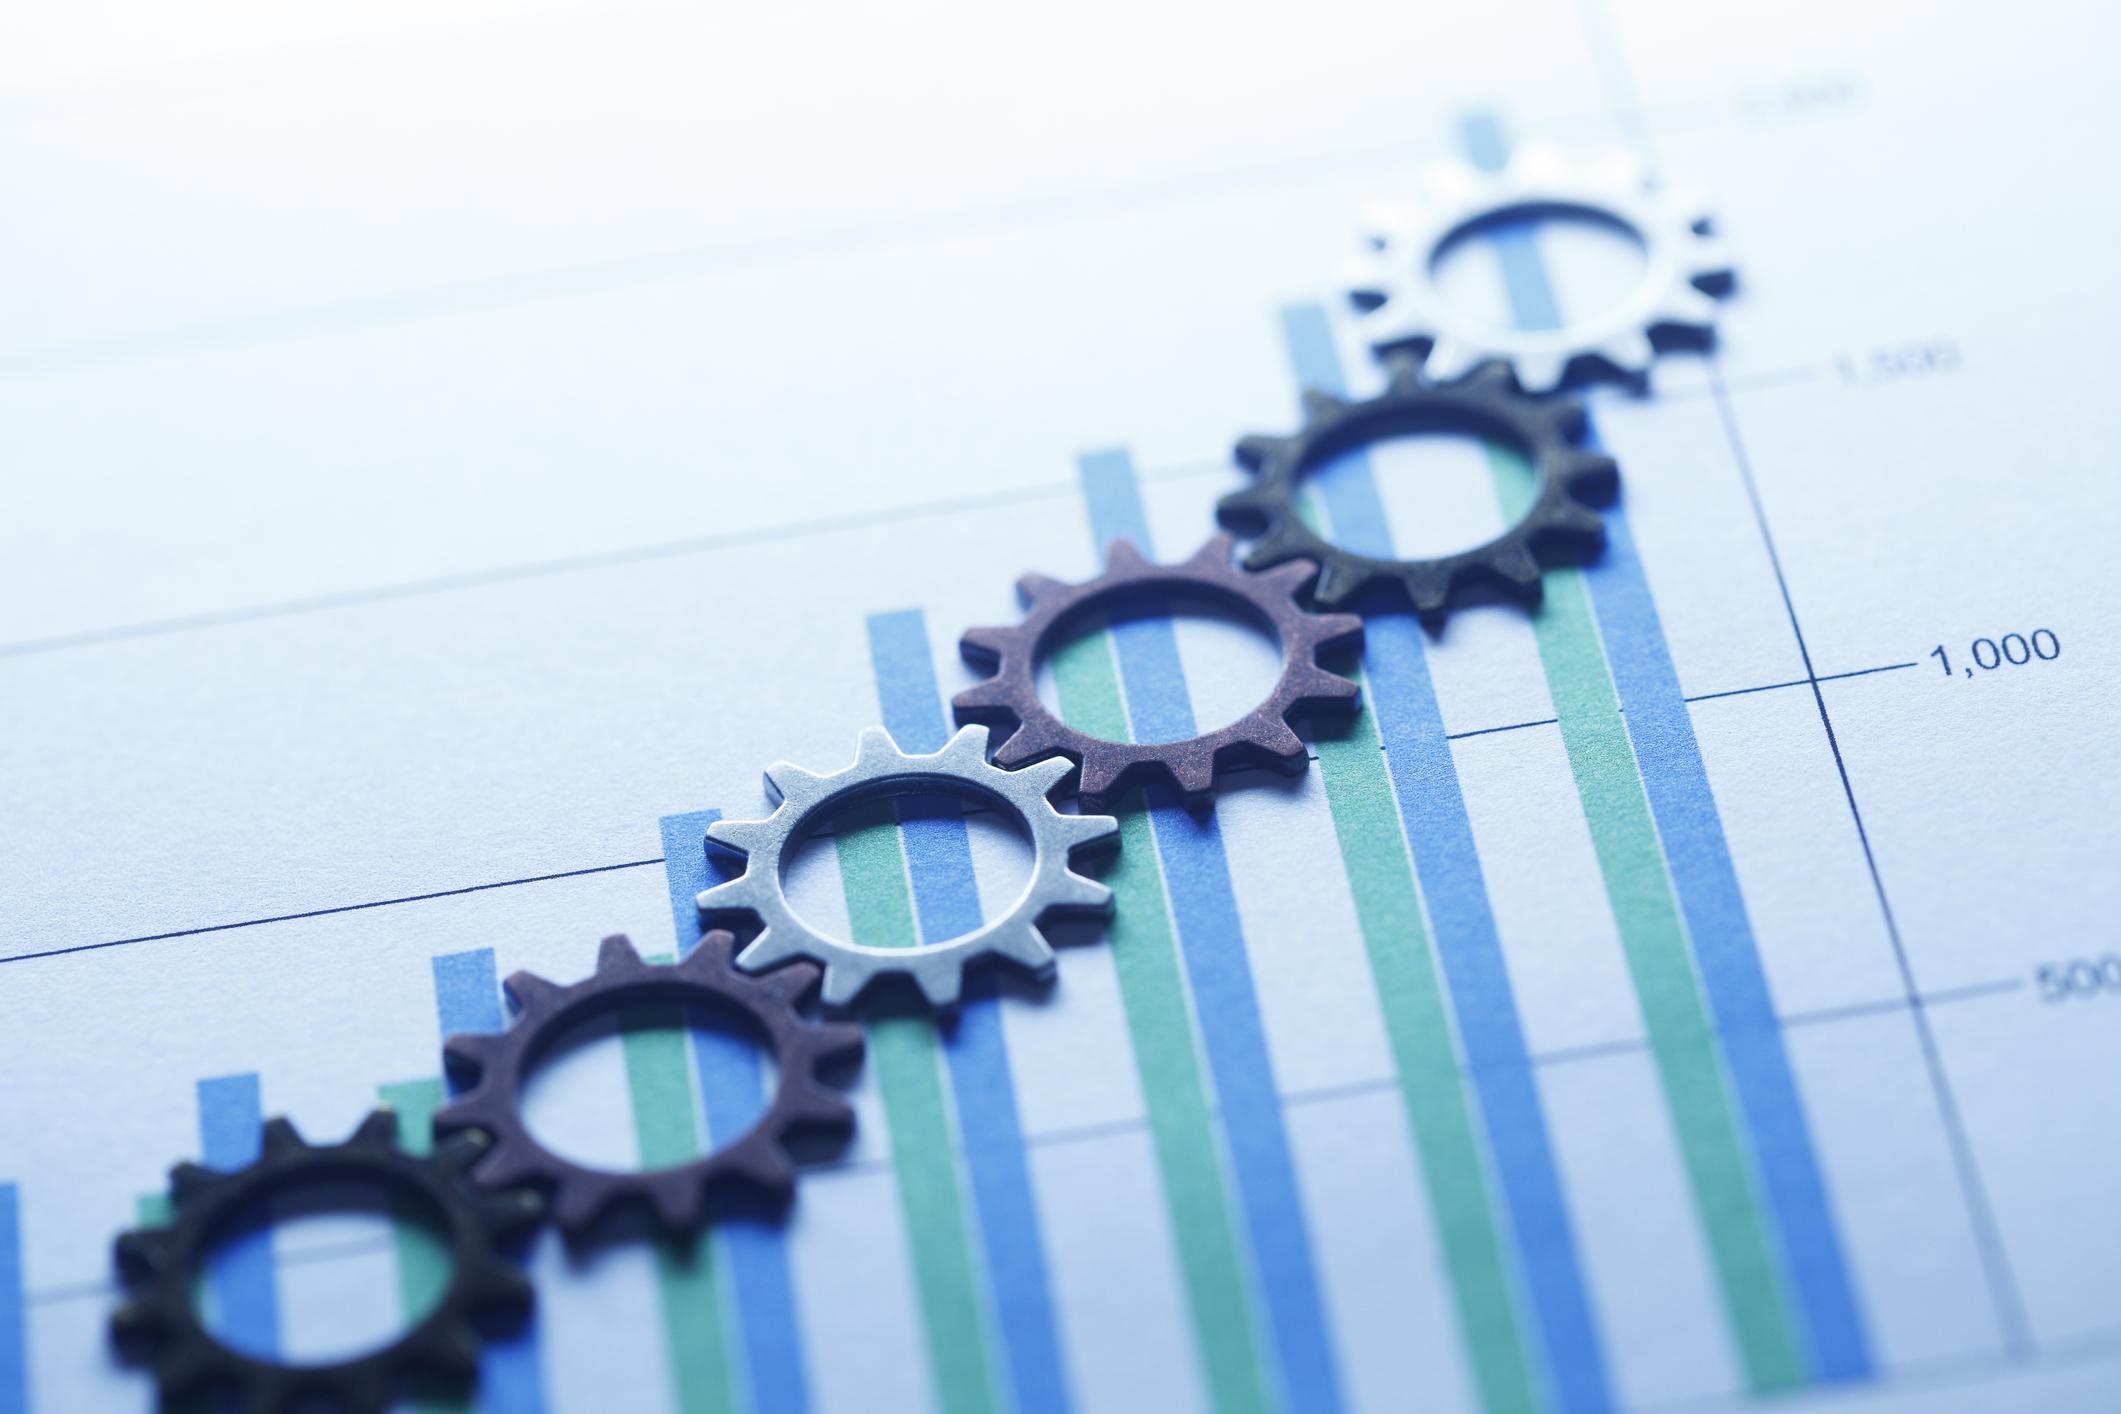 The Hiring Metrics You Need to Be Tracking